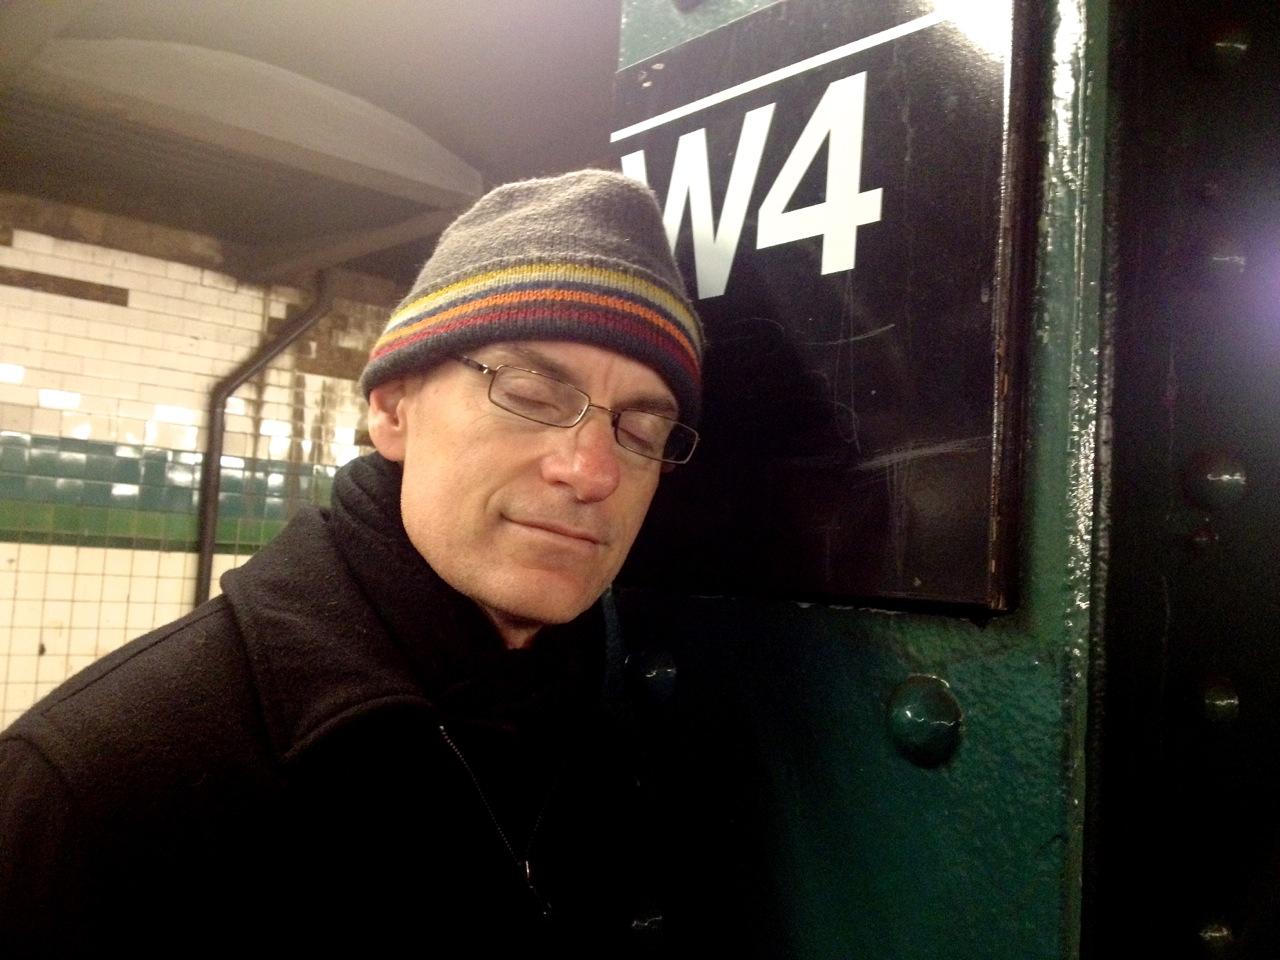 Patrick Santana at the West 4th station